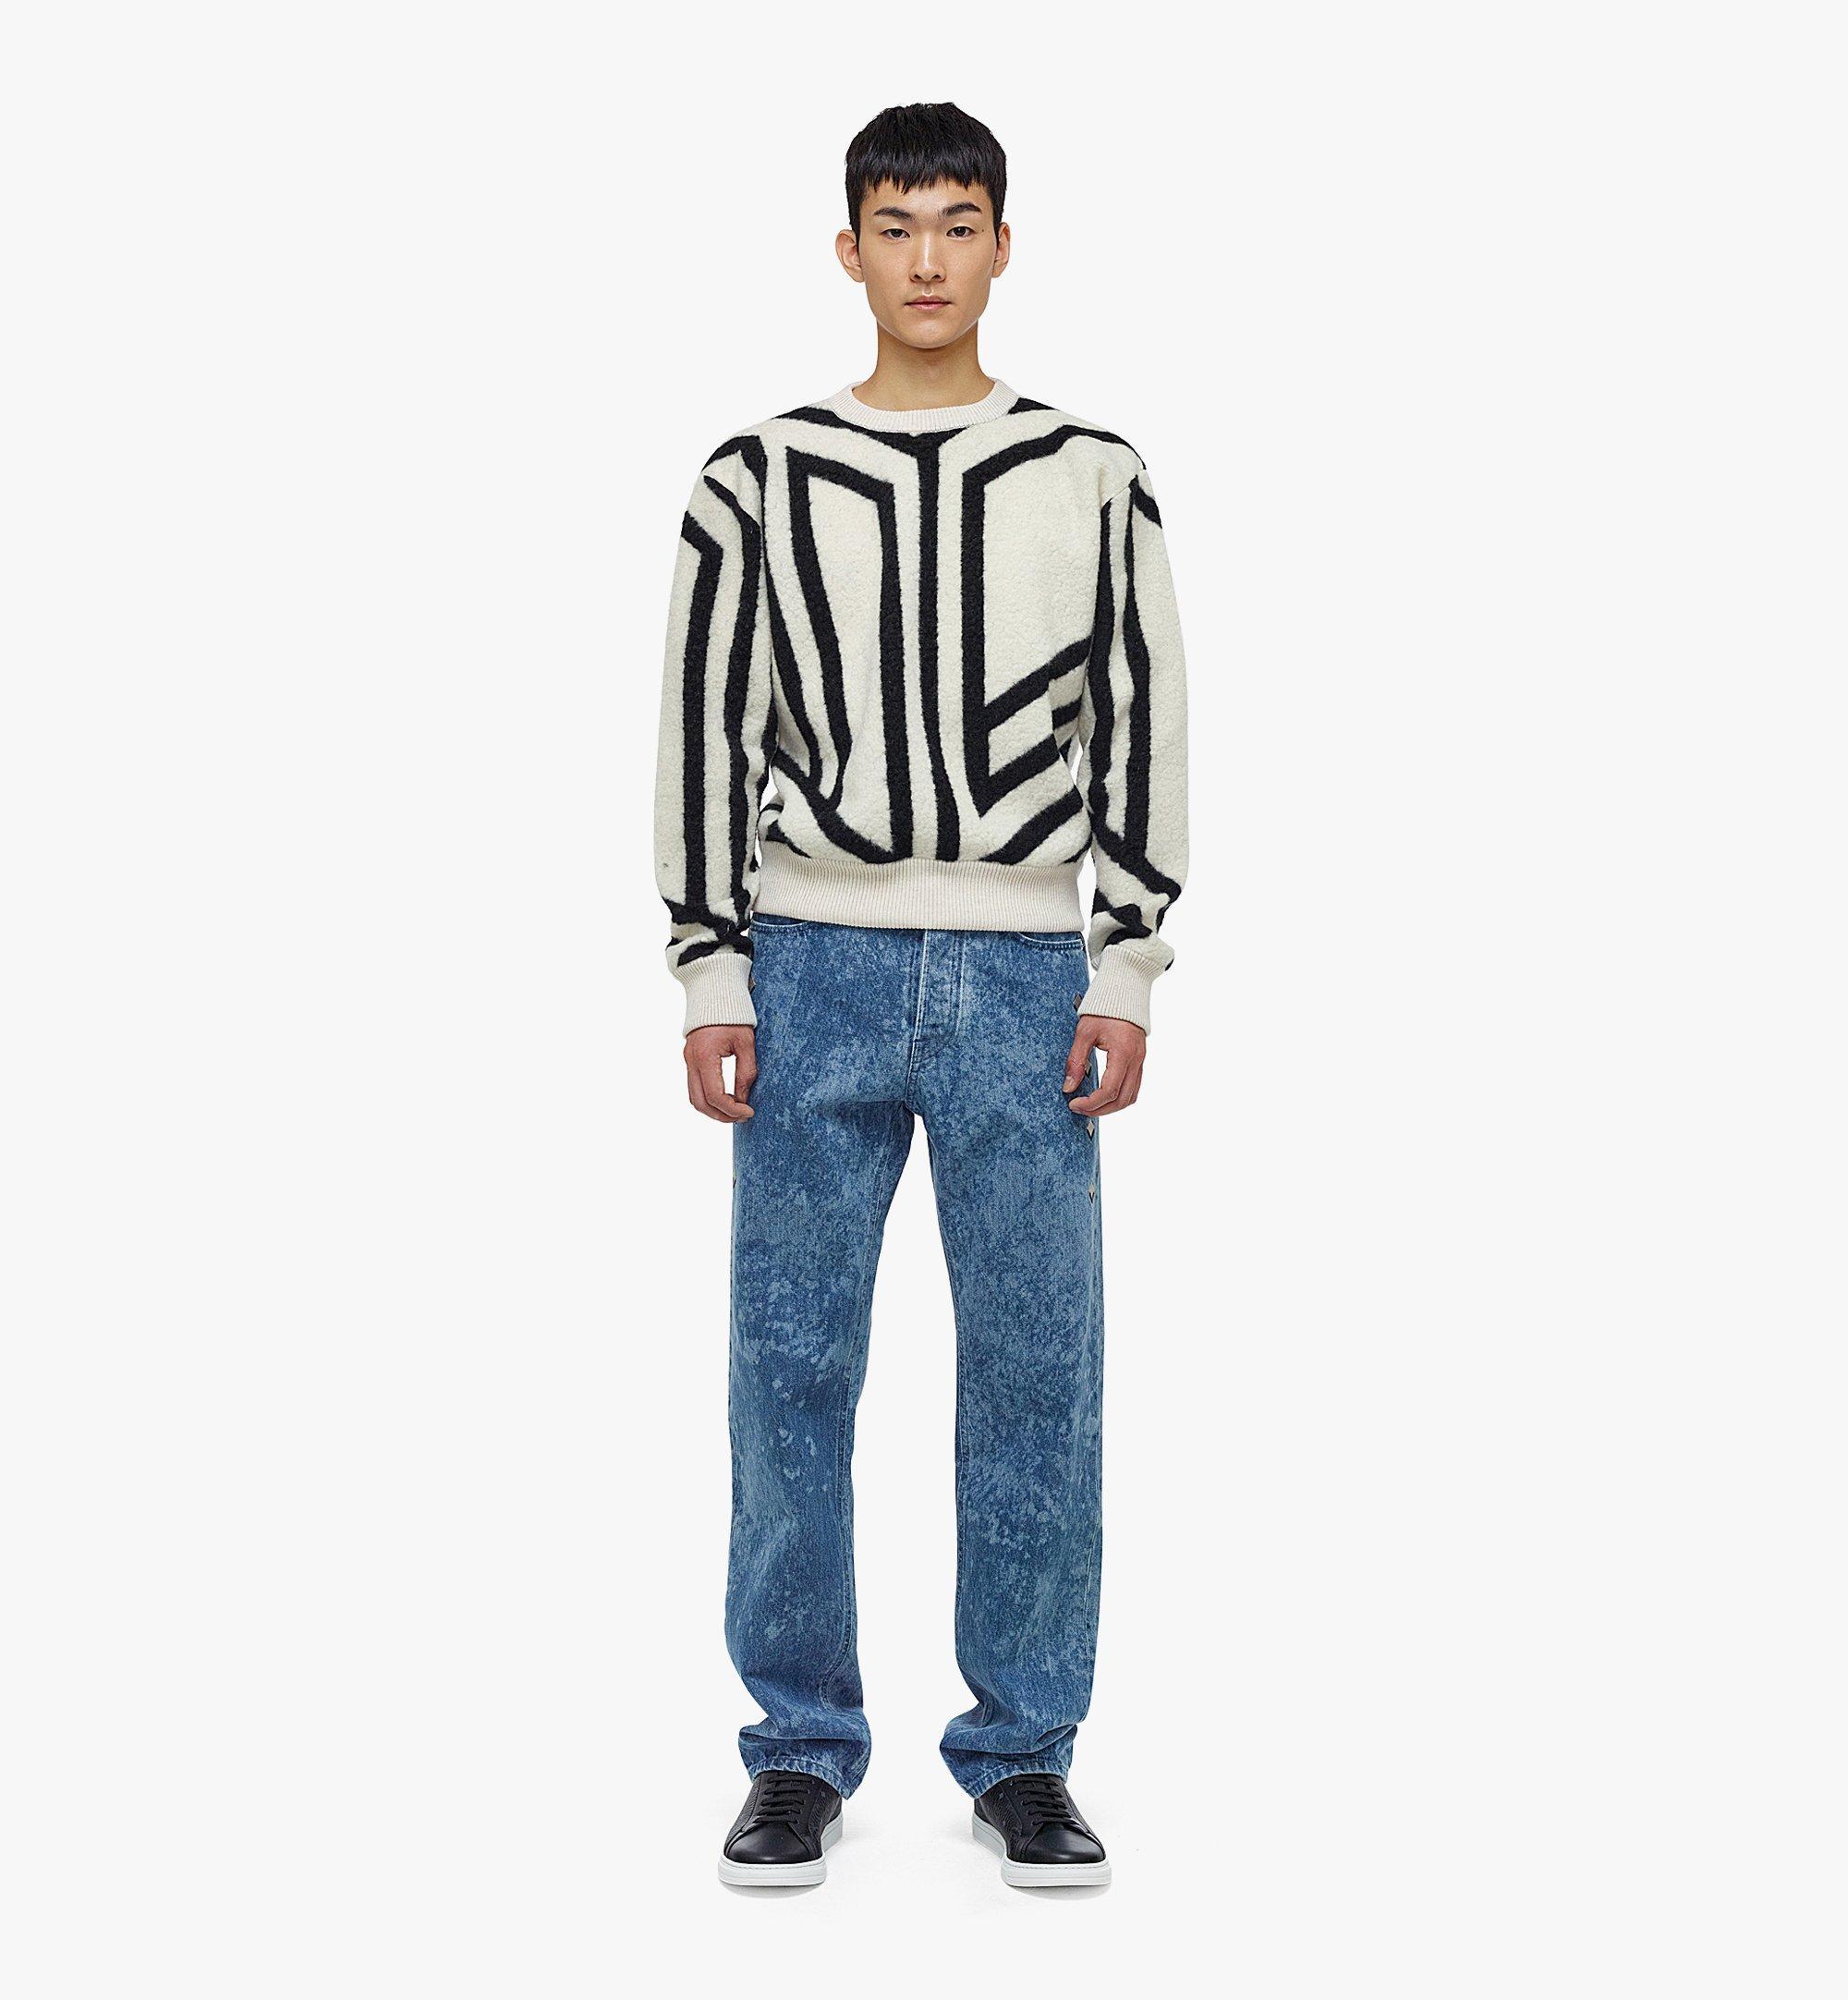 MCM Men's Cubic Monogram Wool Sweatshirt White MHABAMM02W700L Alternate View 3